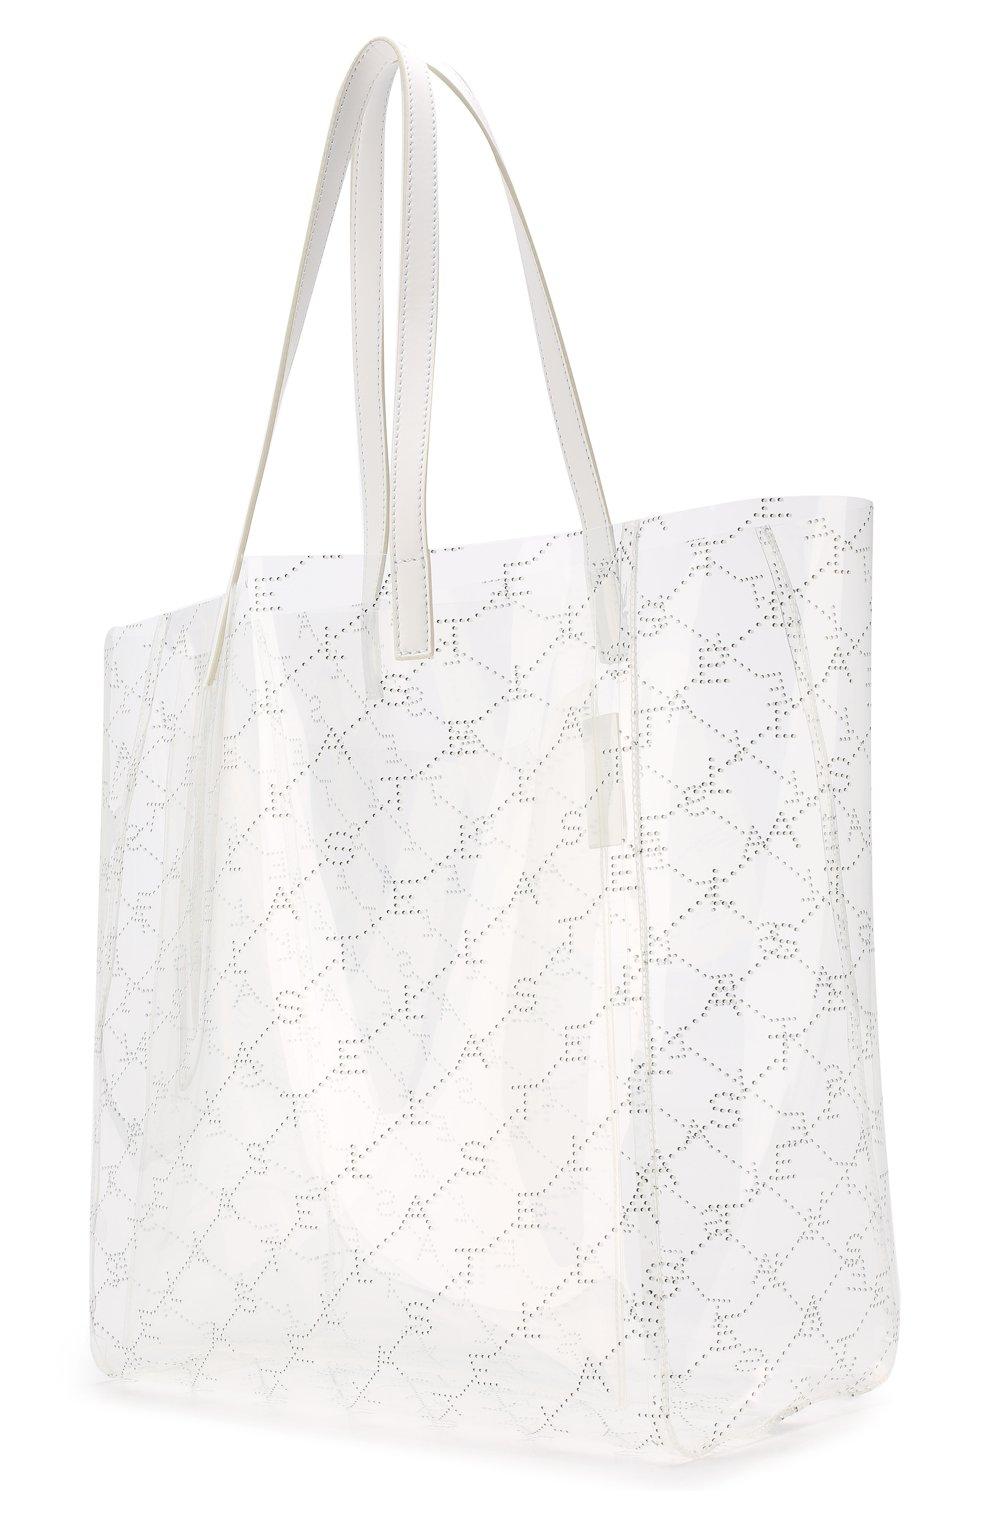 Женская сумка-тоут monogram  STELLA MCCARTNEY прозрачного цвета, арт. 541619/W8464 | Фото 3